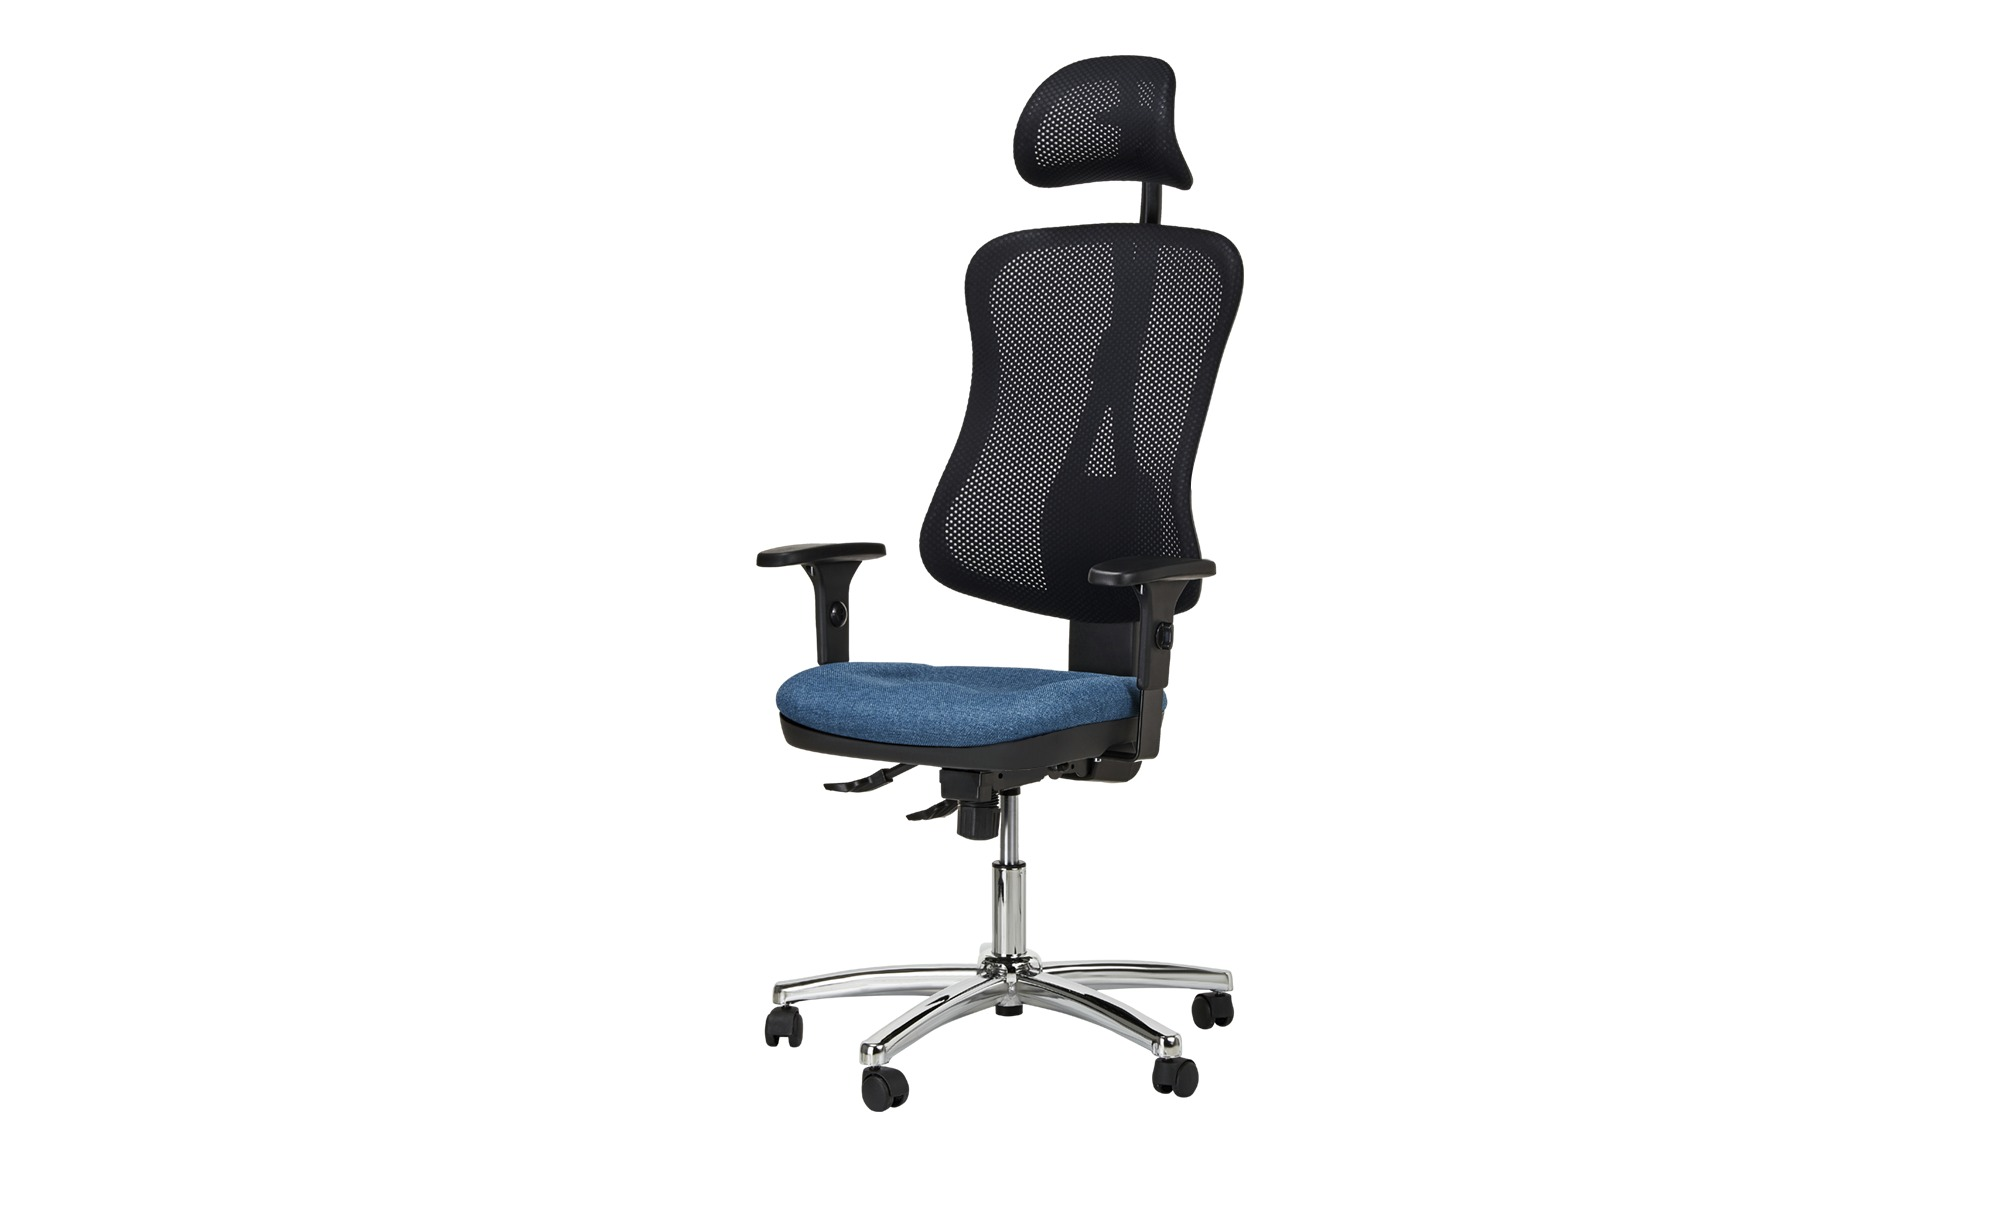 home worx Bürodrehstuhl - Stühle > Bürostühle > Drehstühle - Möbel Kraft | Büro > Bürostühle und Sessel  | home worx